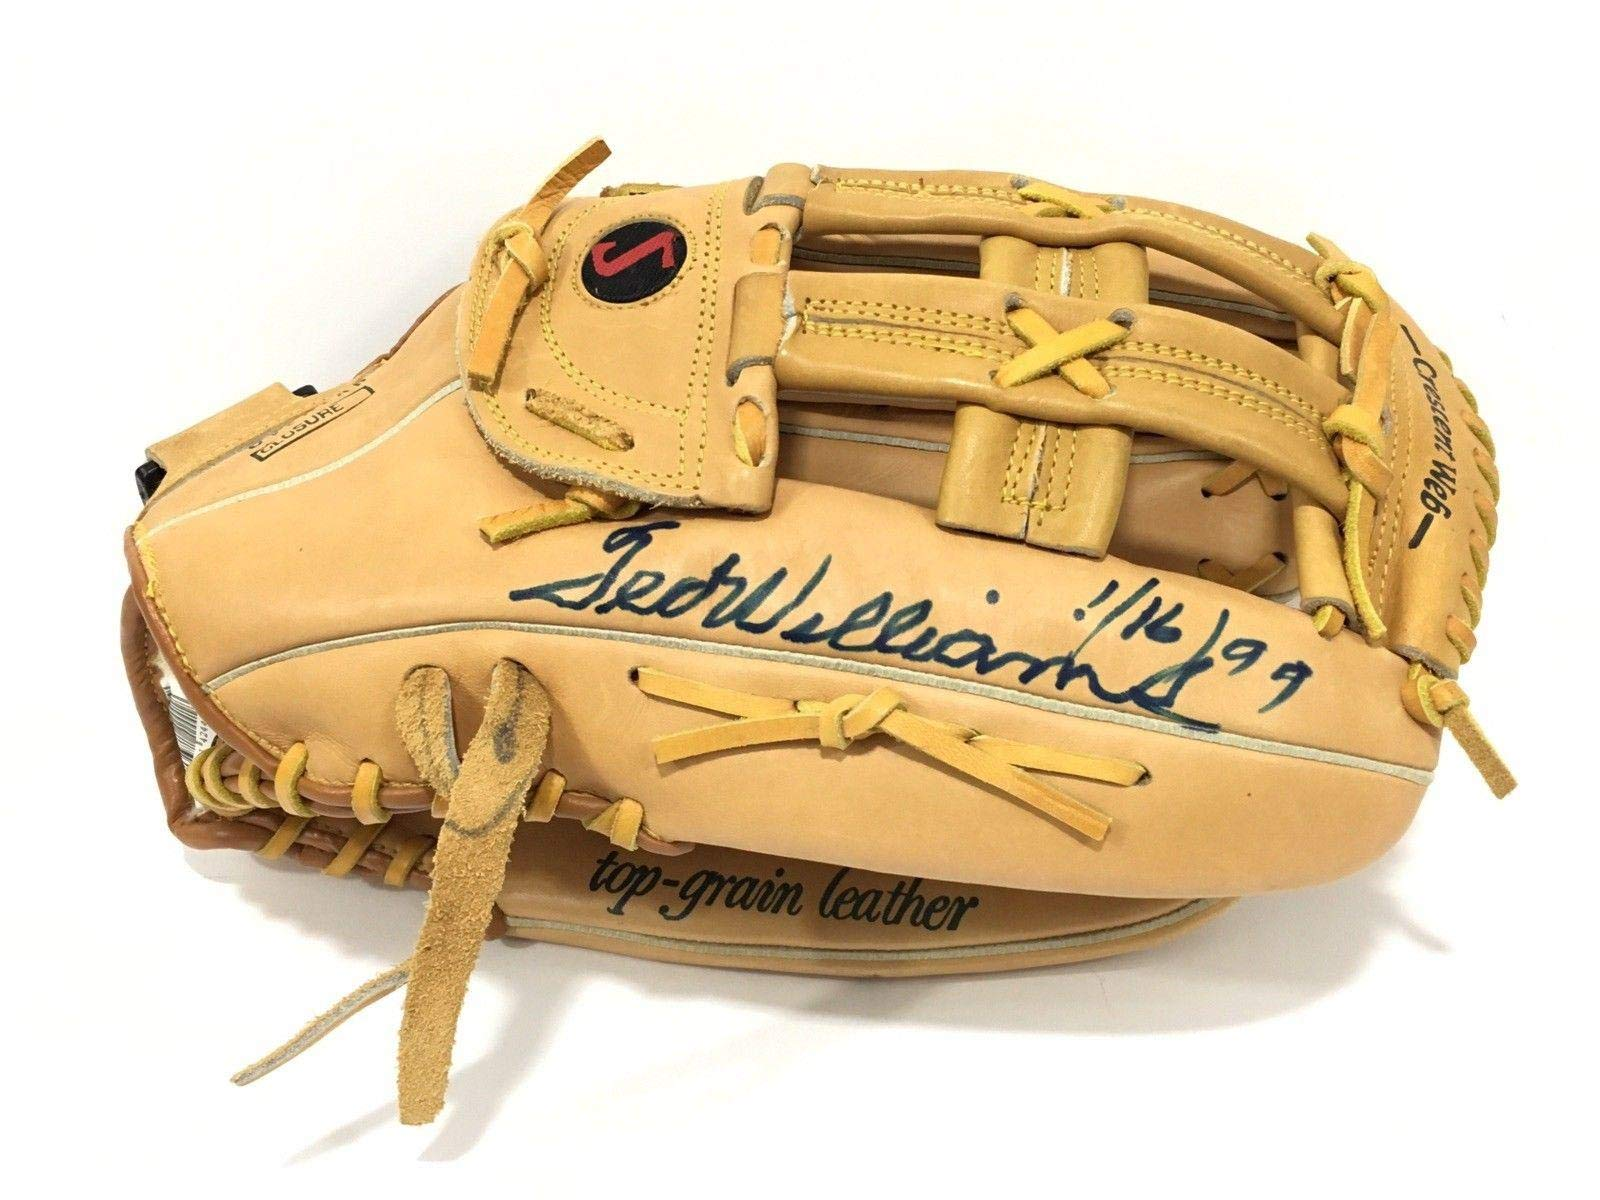 Ted Williams Signed Spalding Baseball Glove Framed LOA Boston Red Sox JSA Certified Autographed MLB Gloves